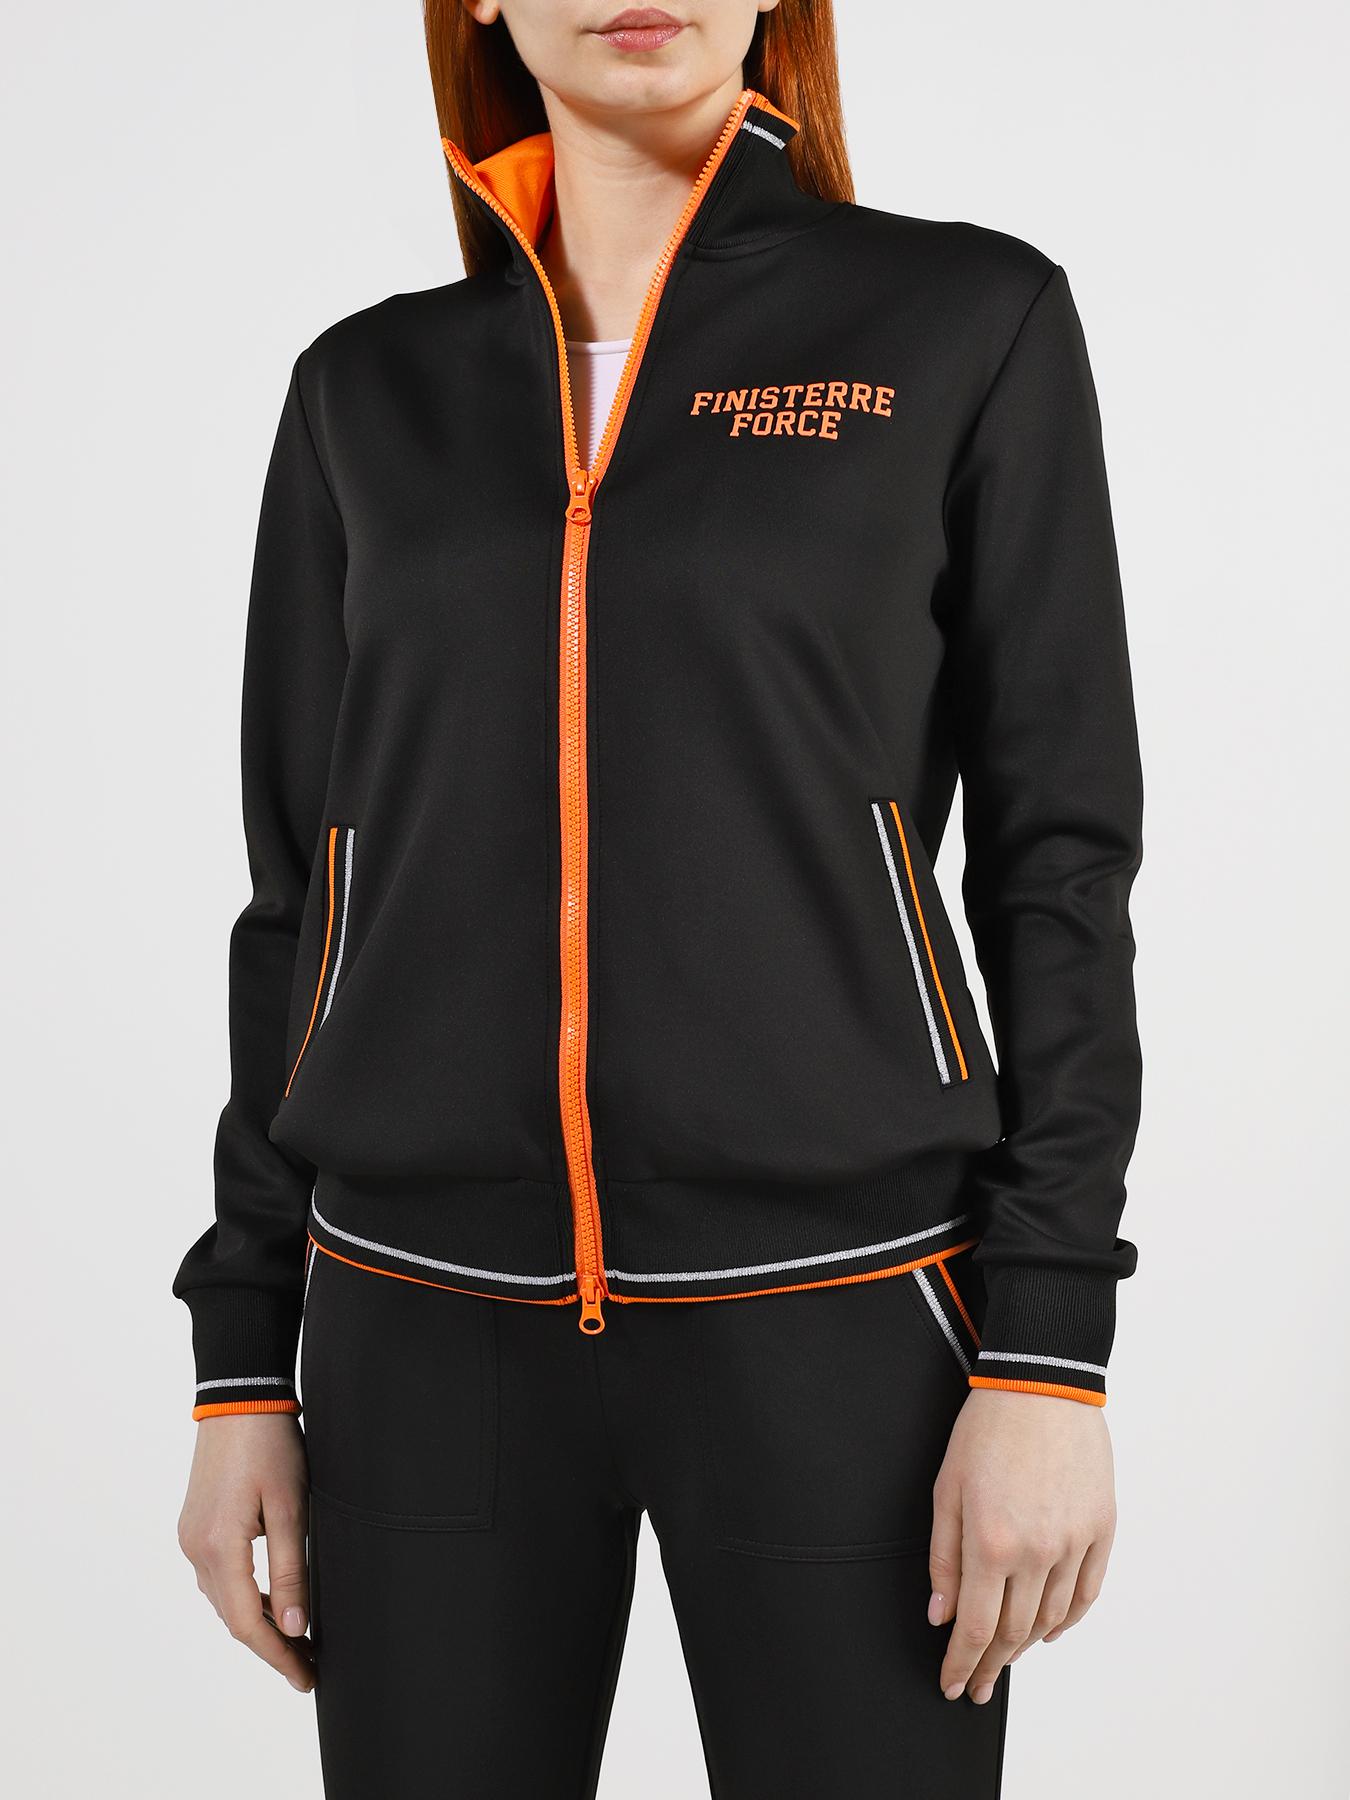 Костюм спортивный Finisterre Force Спортивный костюм костюм спортивный blacksi blacksi mp002xw0h59r